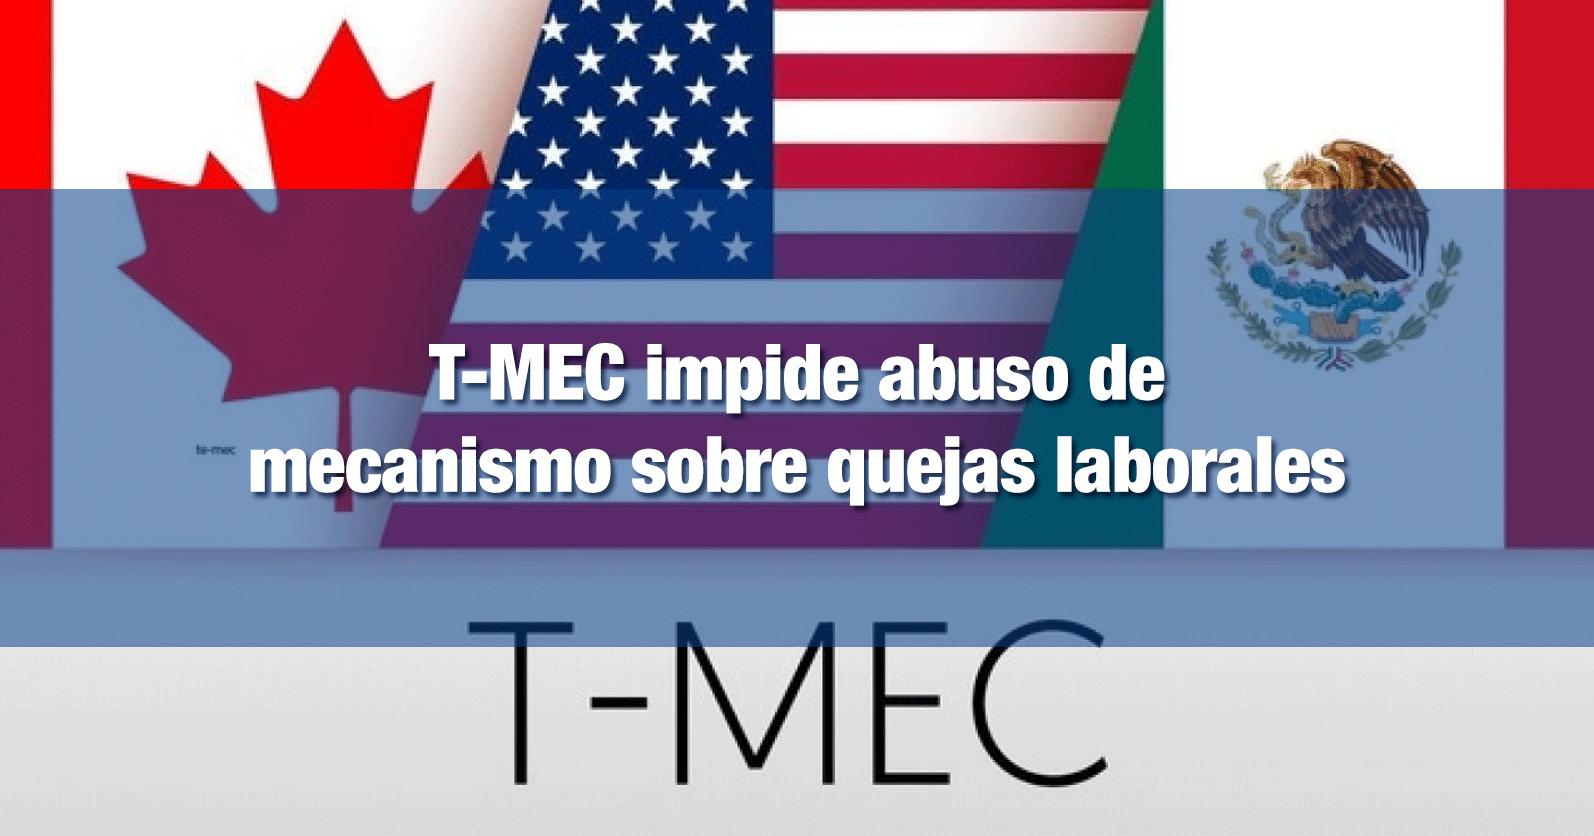 T-MEC impide abuso de mecanismo sobre quejas laborales